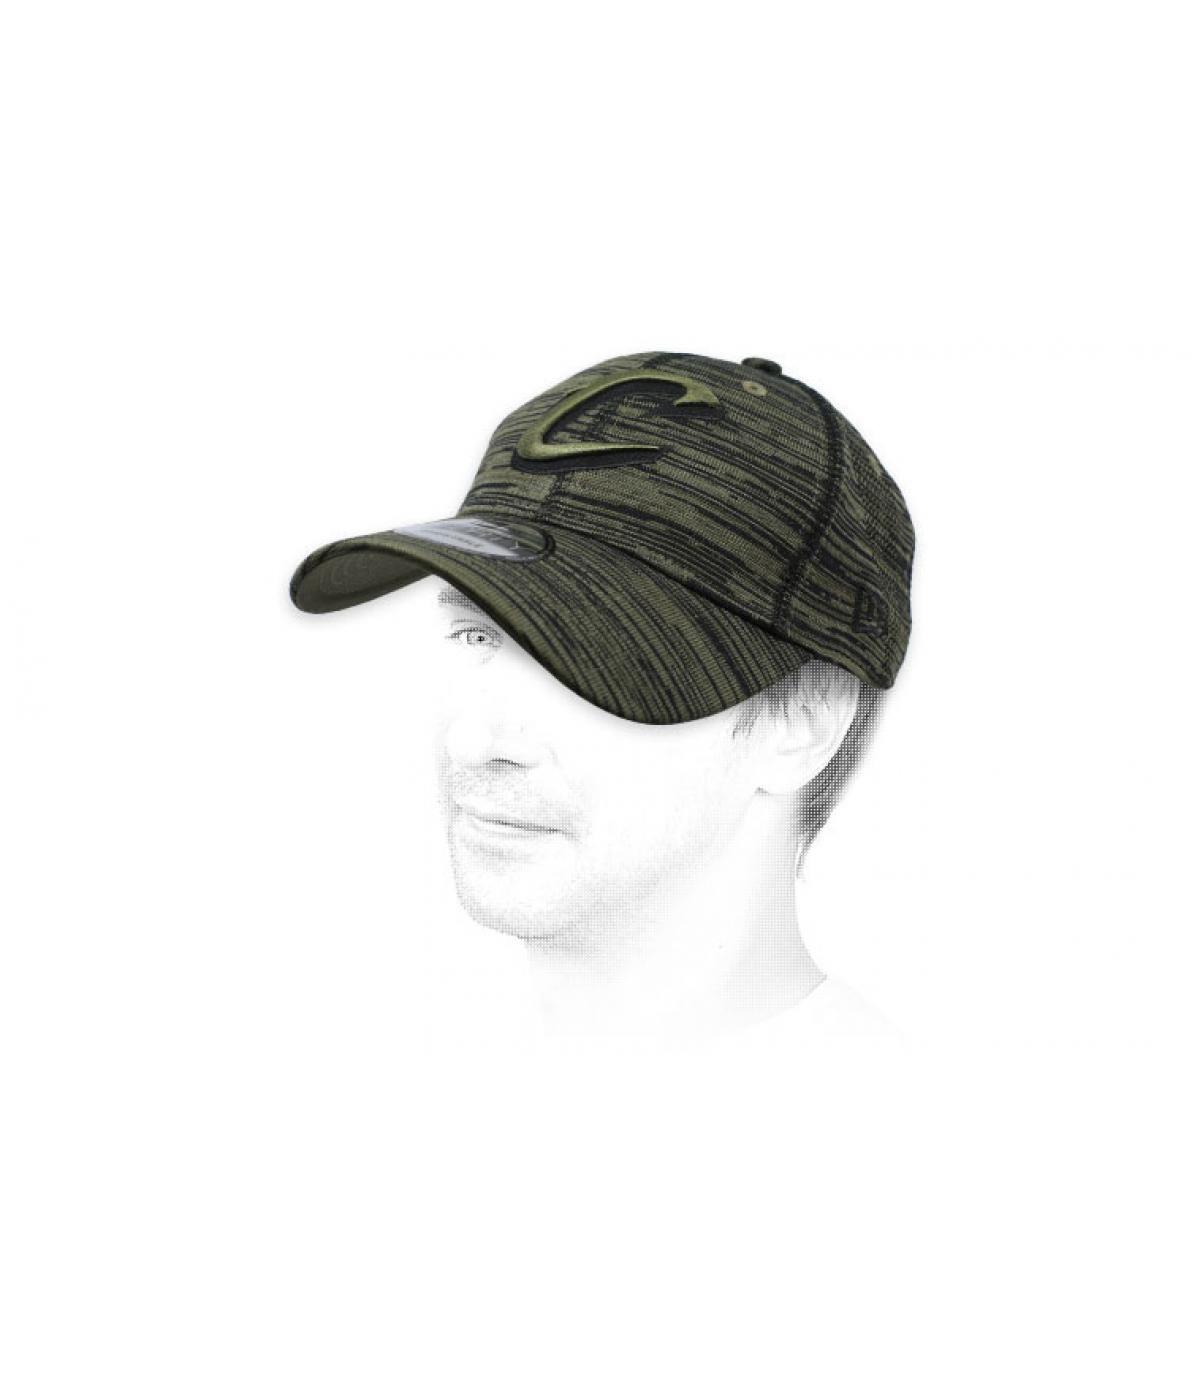 green C engineered cap